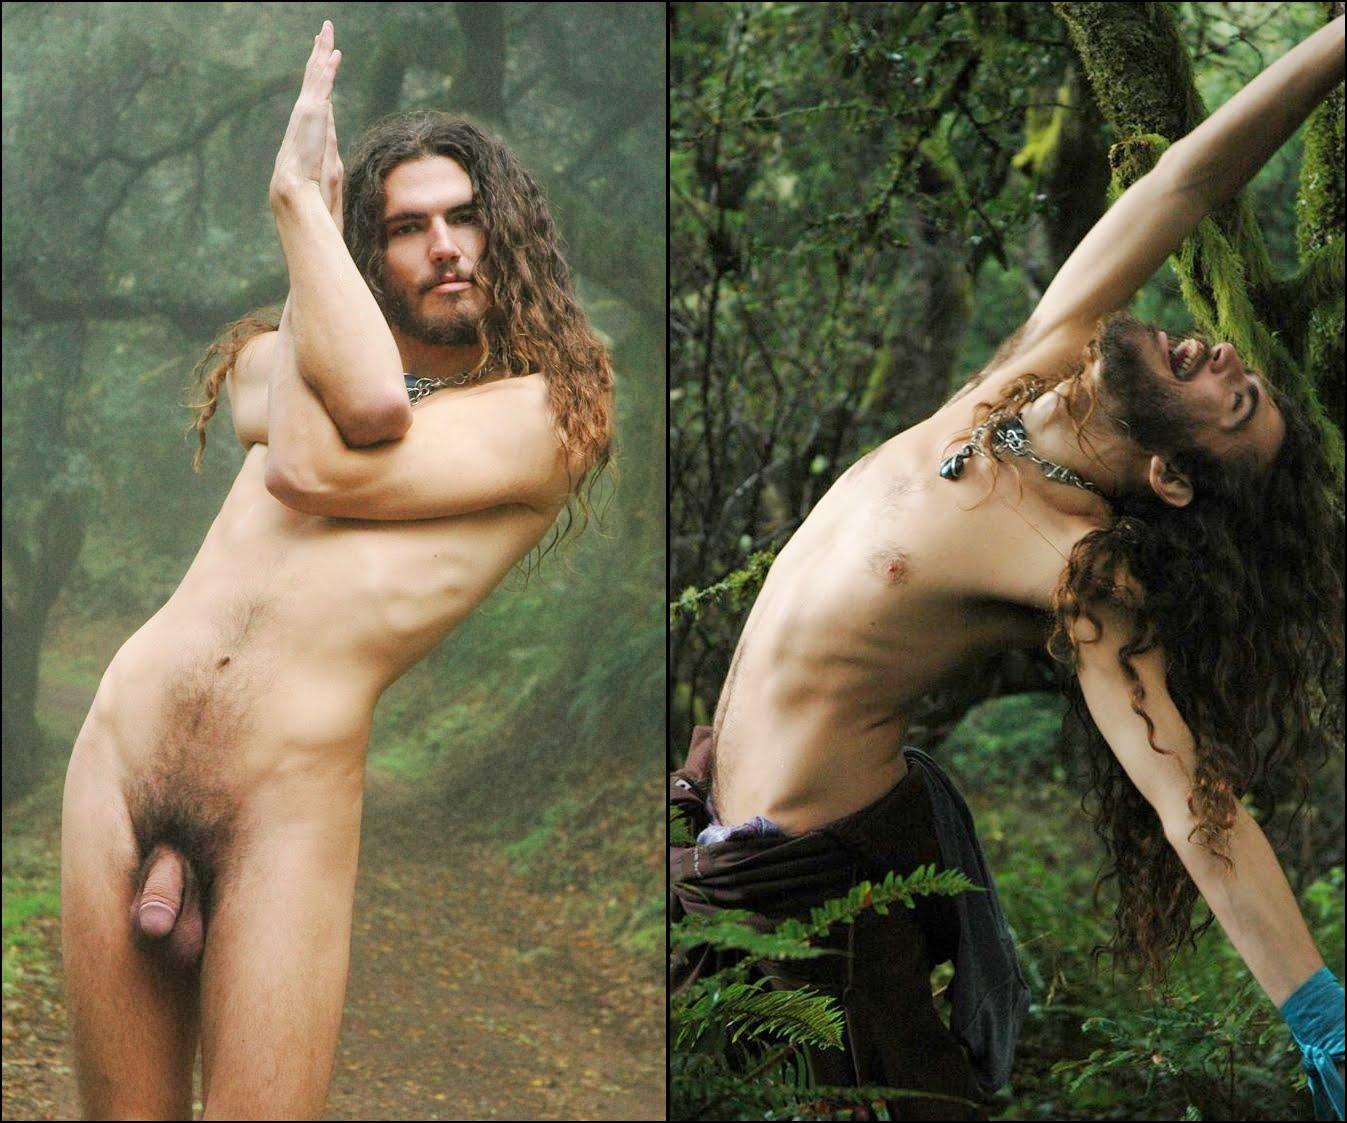 Hippie man naked